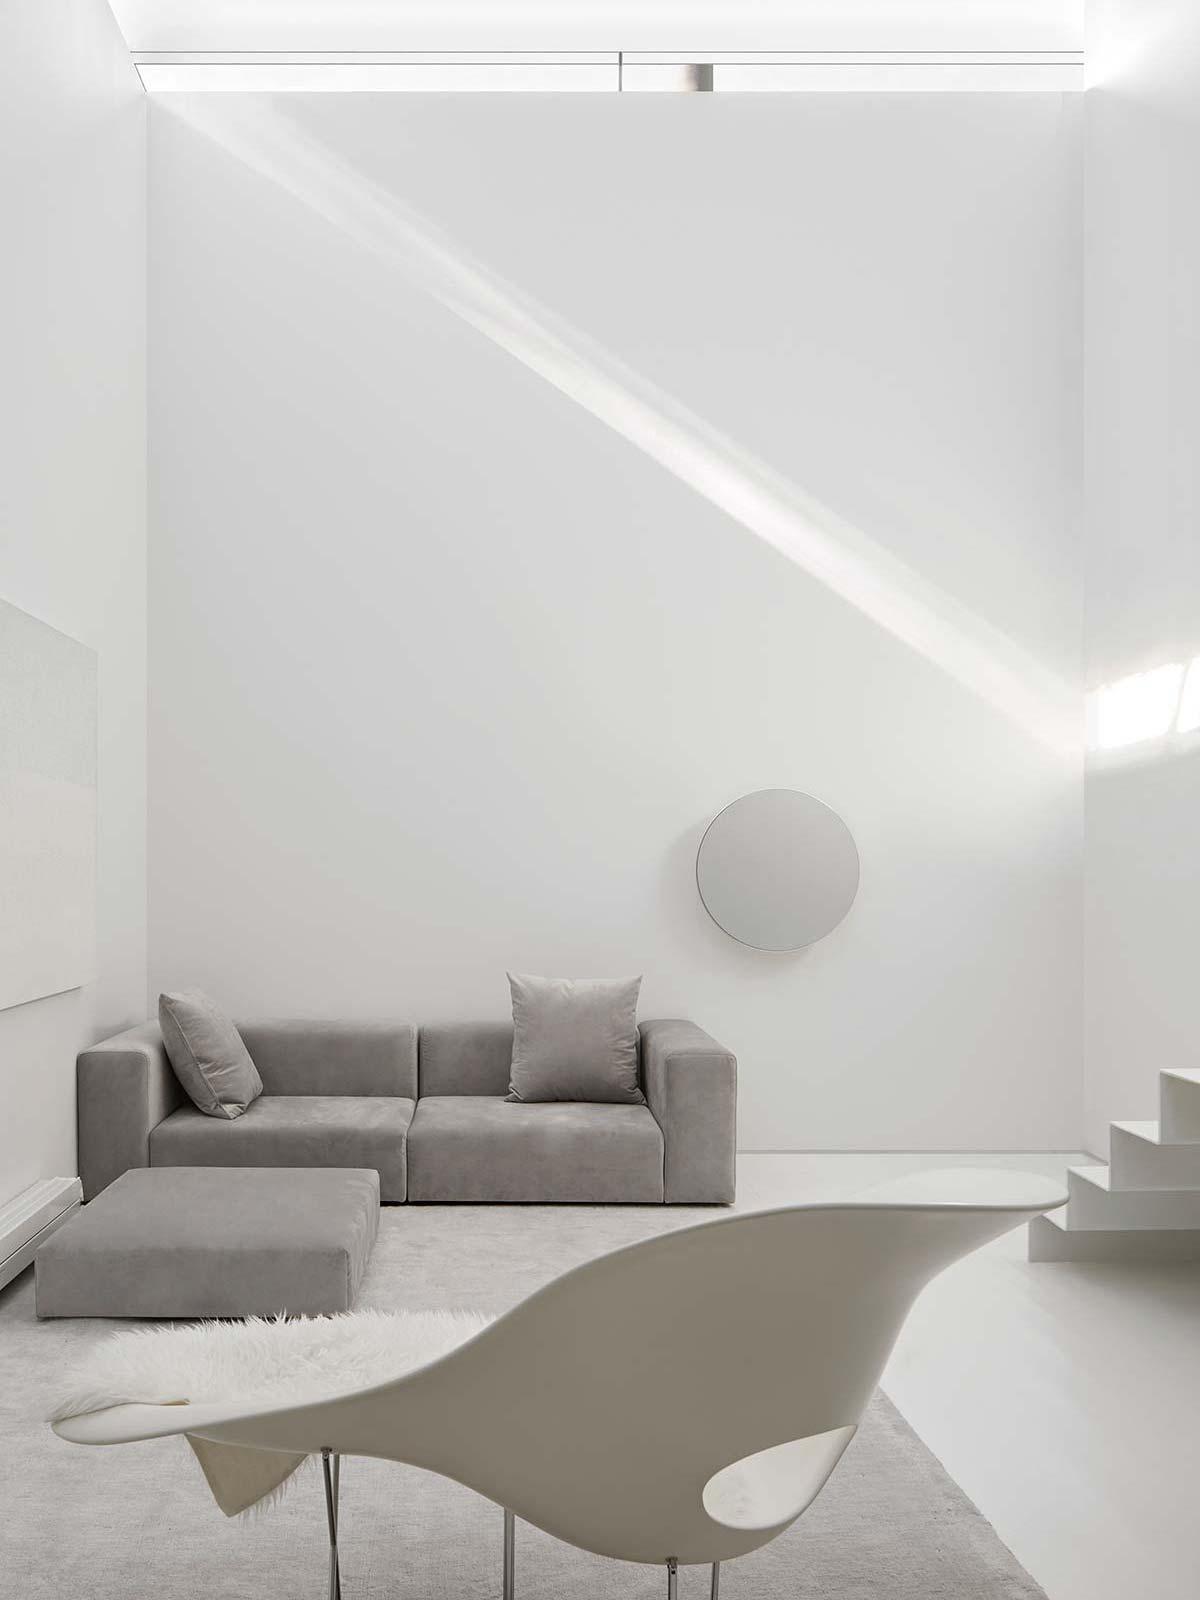 ShadowBox - Design Johnson Chou - Photo © A-Frame Studio